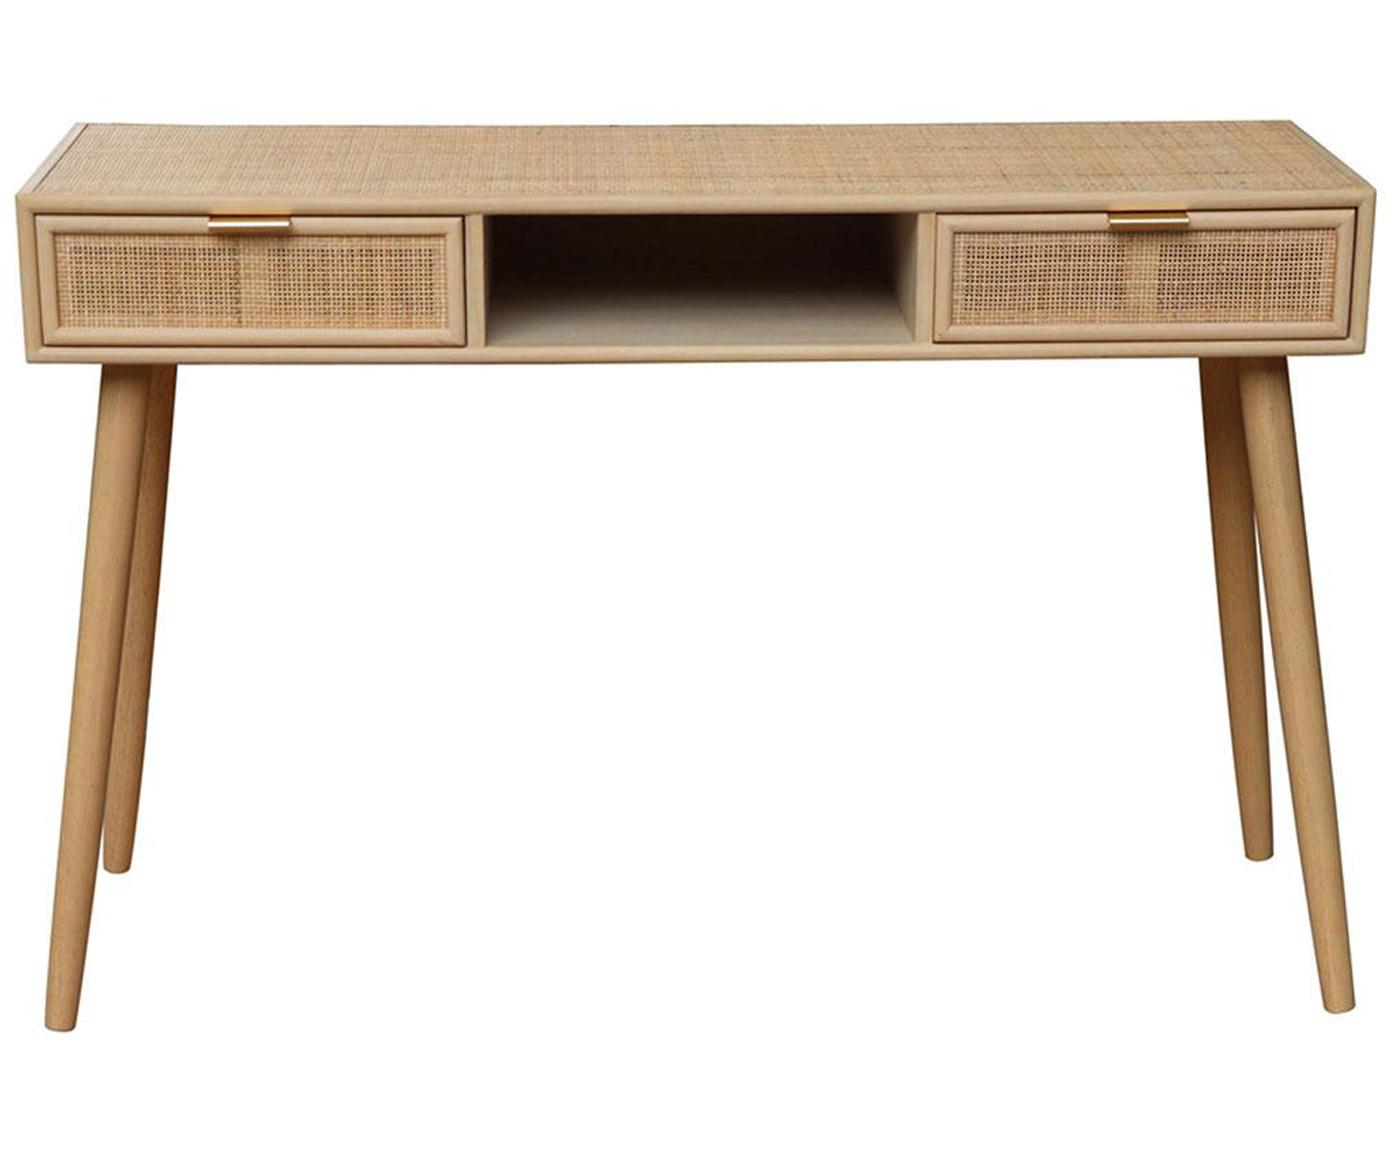 Escritorio Cayetana, Estructura: madera, Beige, An 120 x Al 76 cm